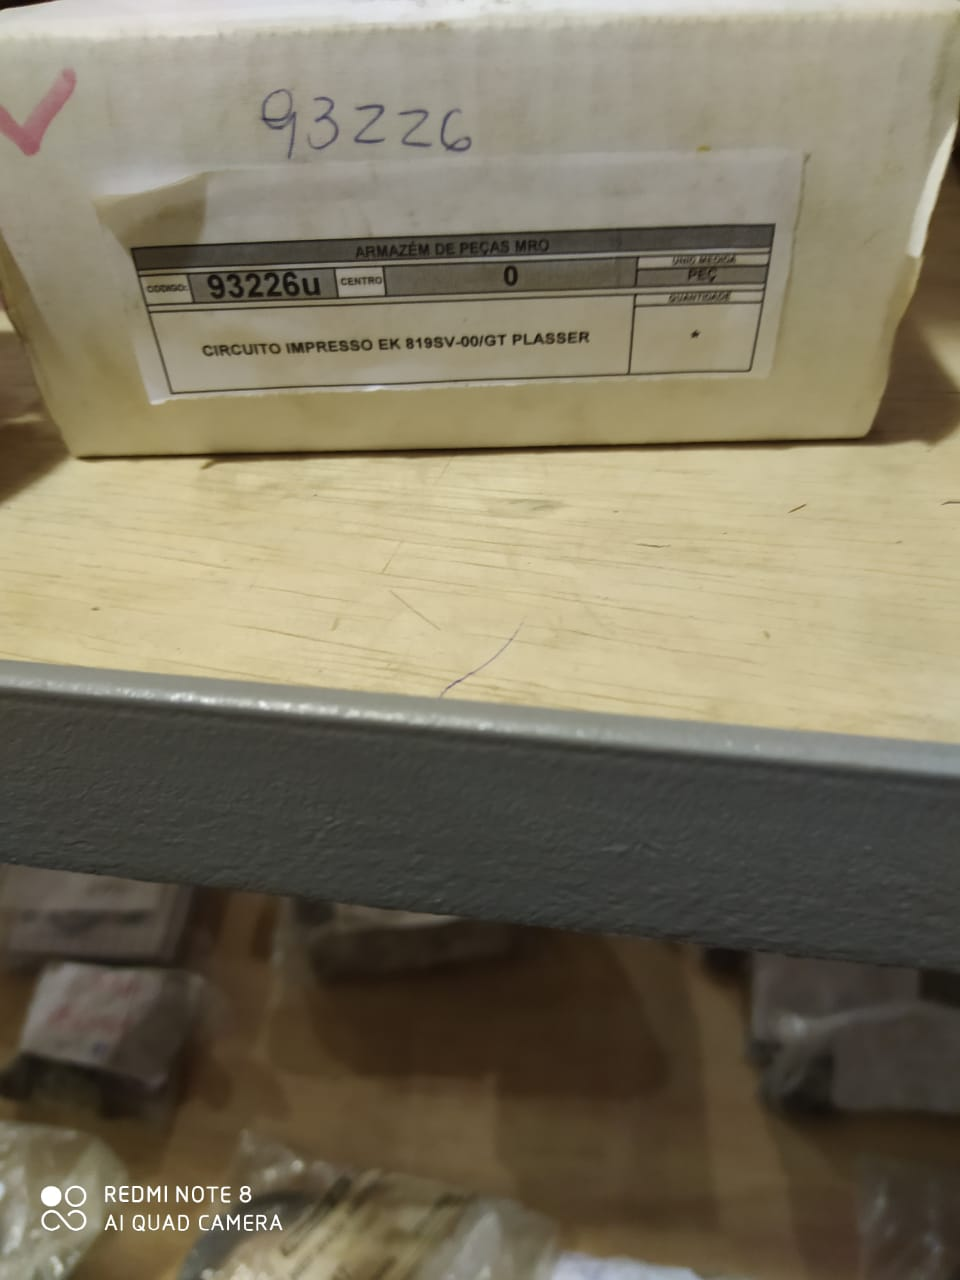 Circuito impresso ek 819sv-00/gt plasser aprox. 1 peça